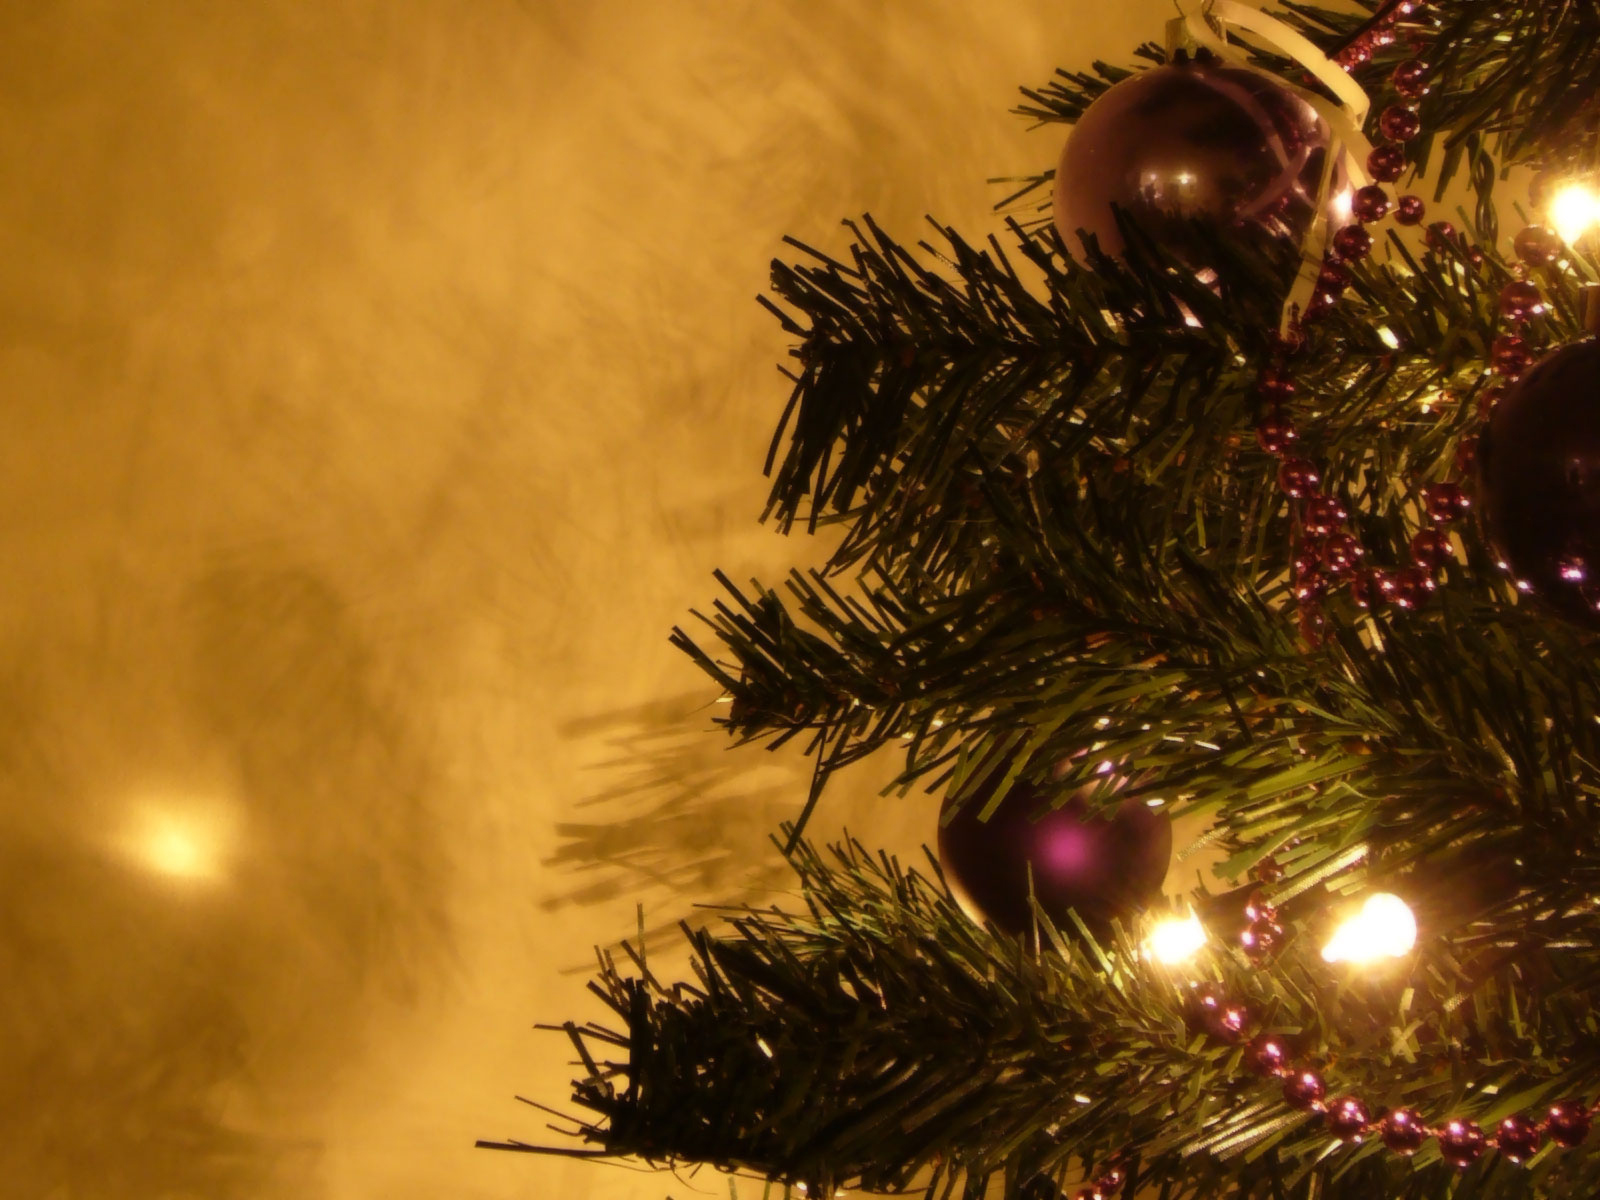 Christmas Wallpaper | 3D Wallpaper | Nature Wallpaper | Free Download ...